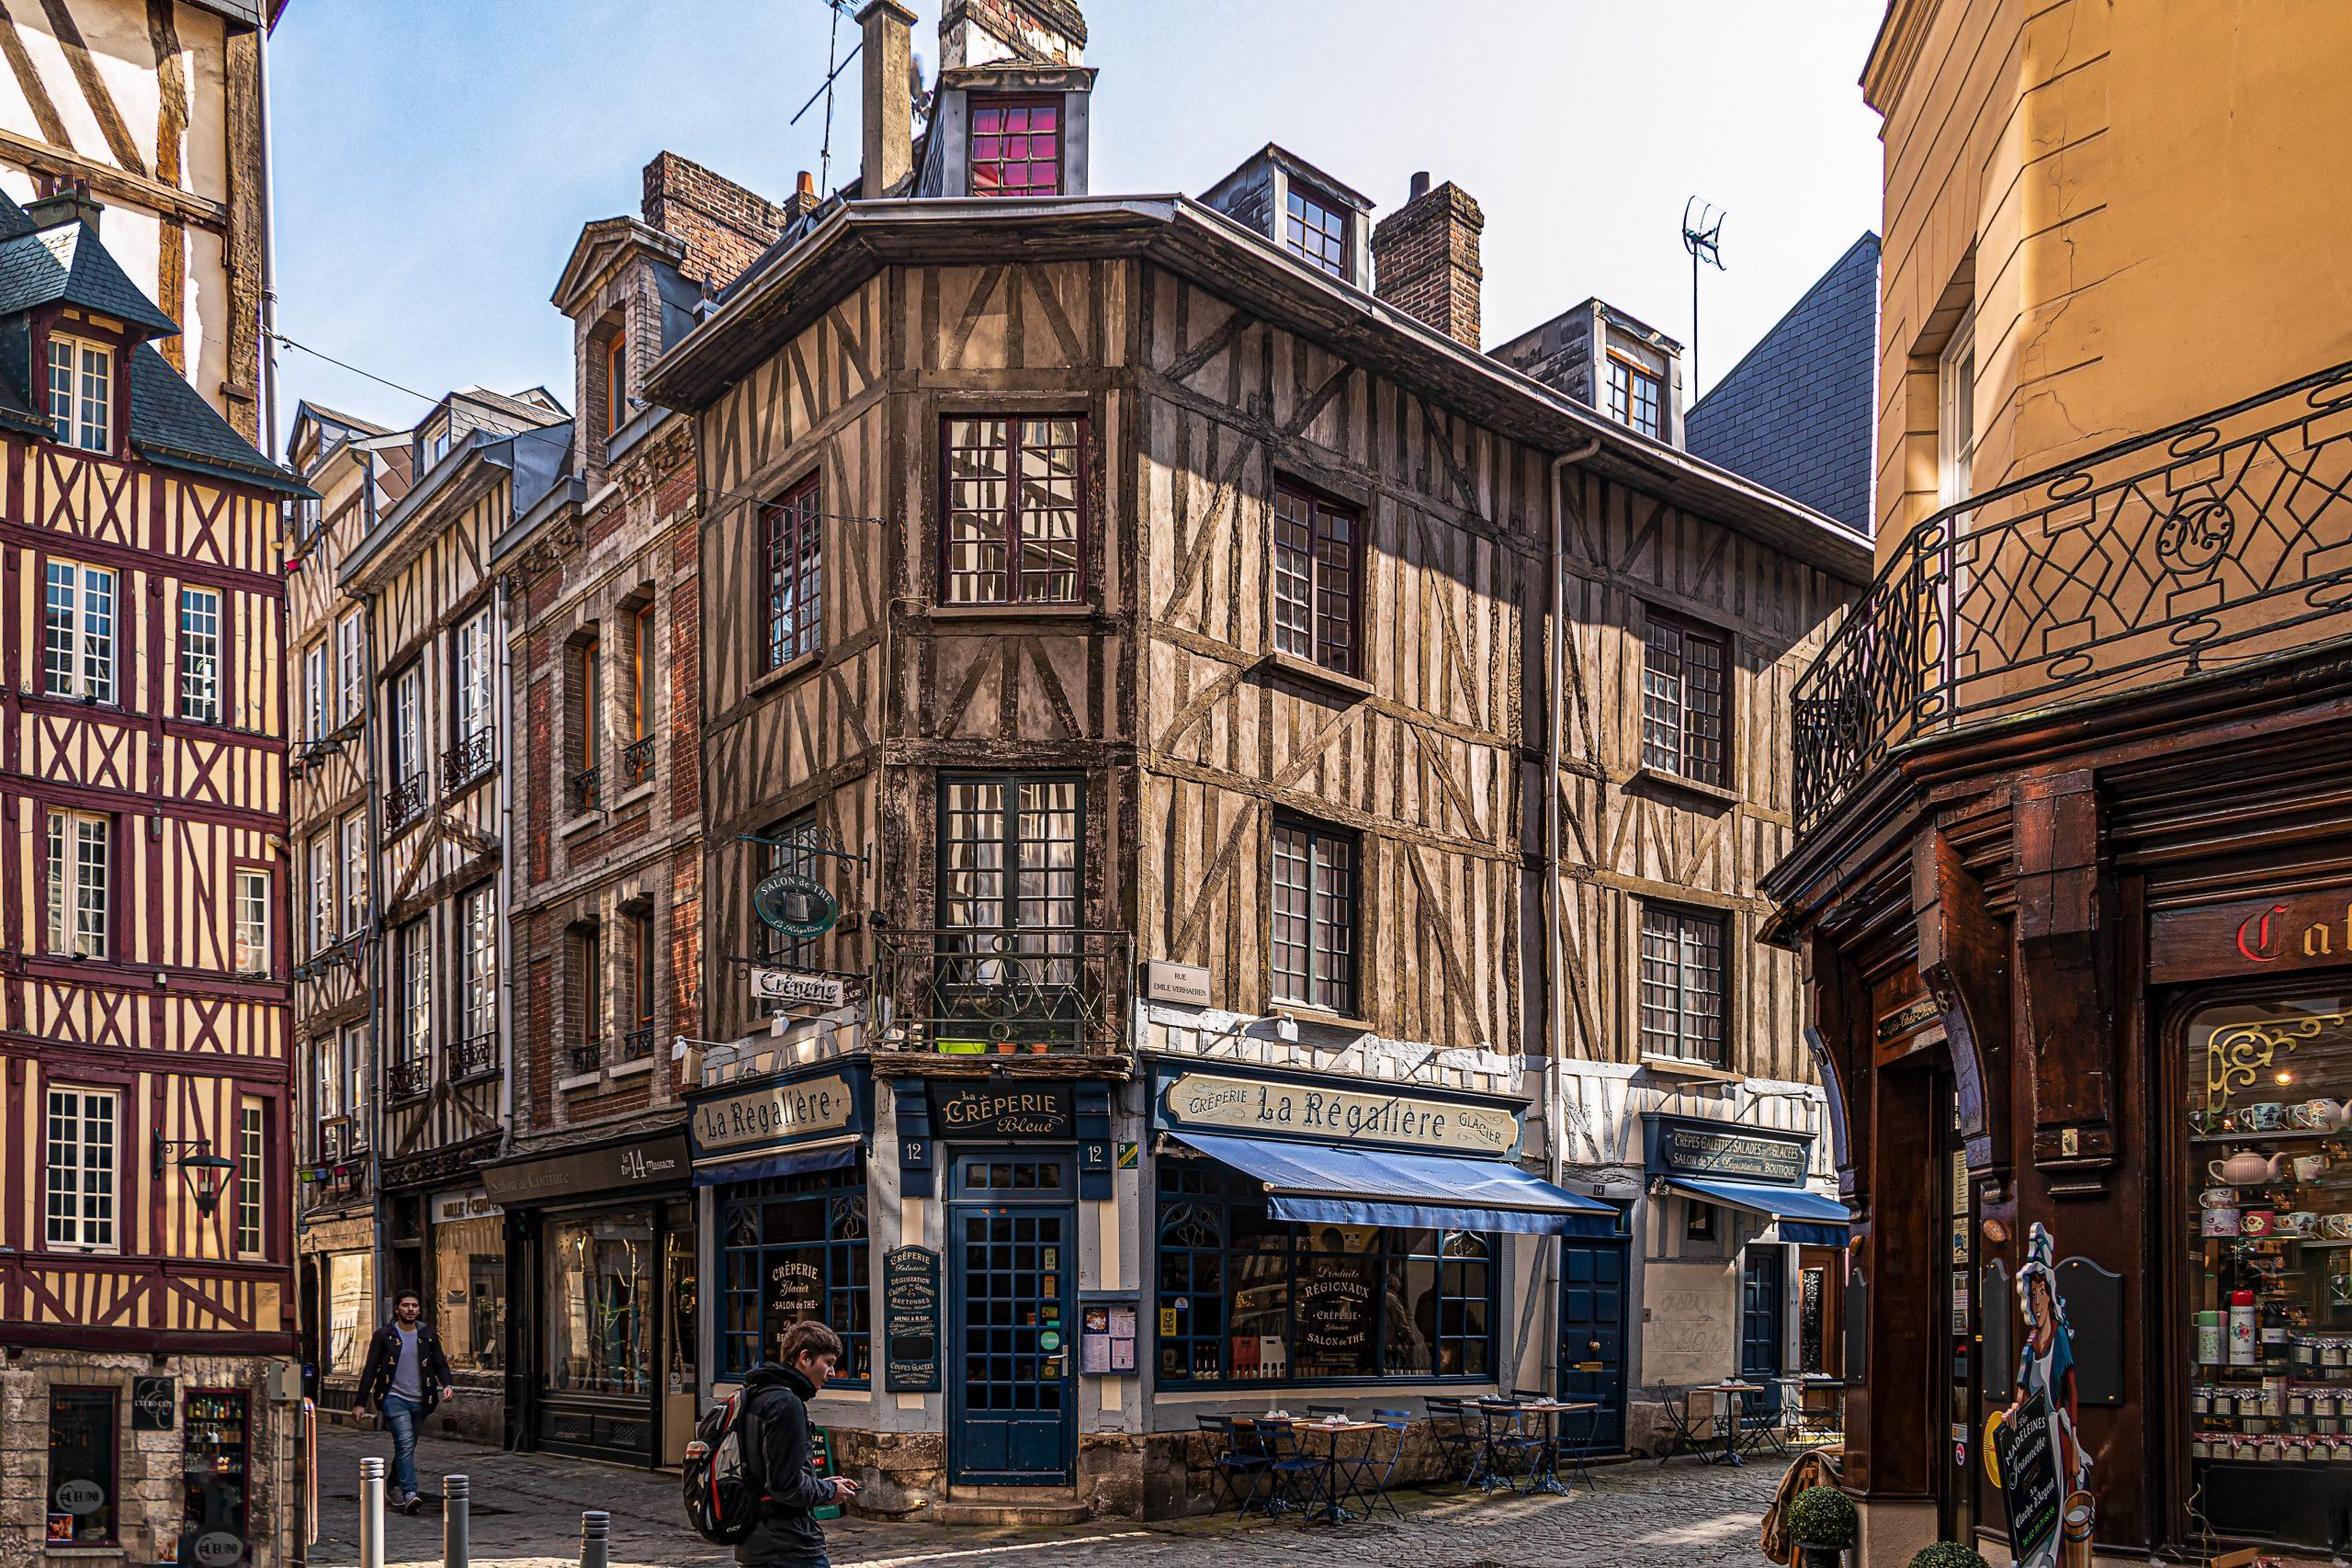 visiter Rouen en 1 ou 2 jours week end